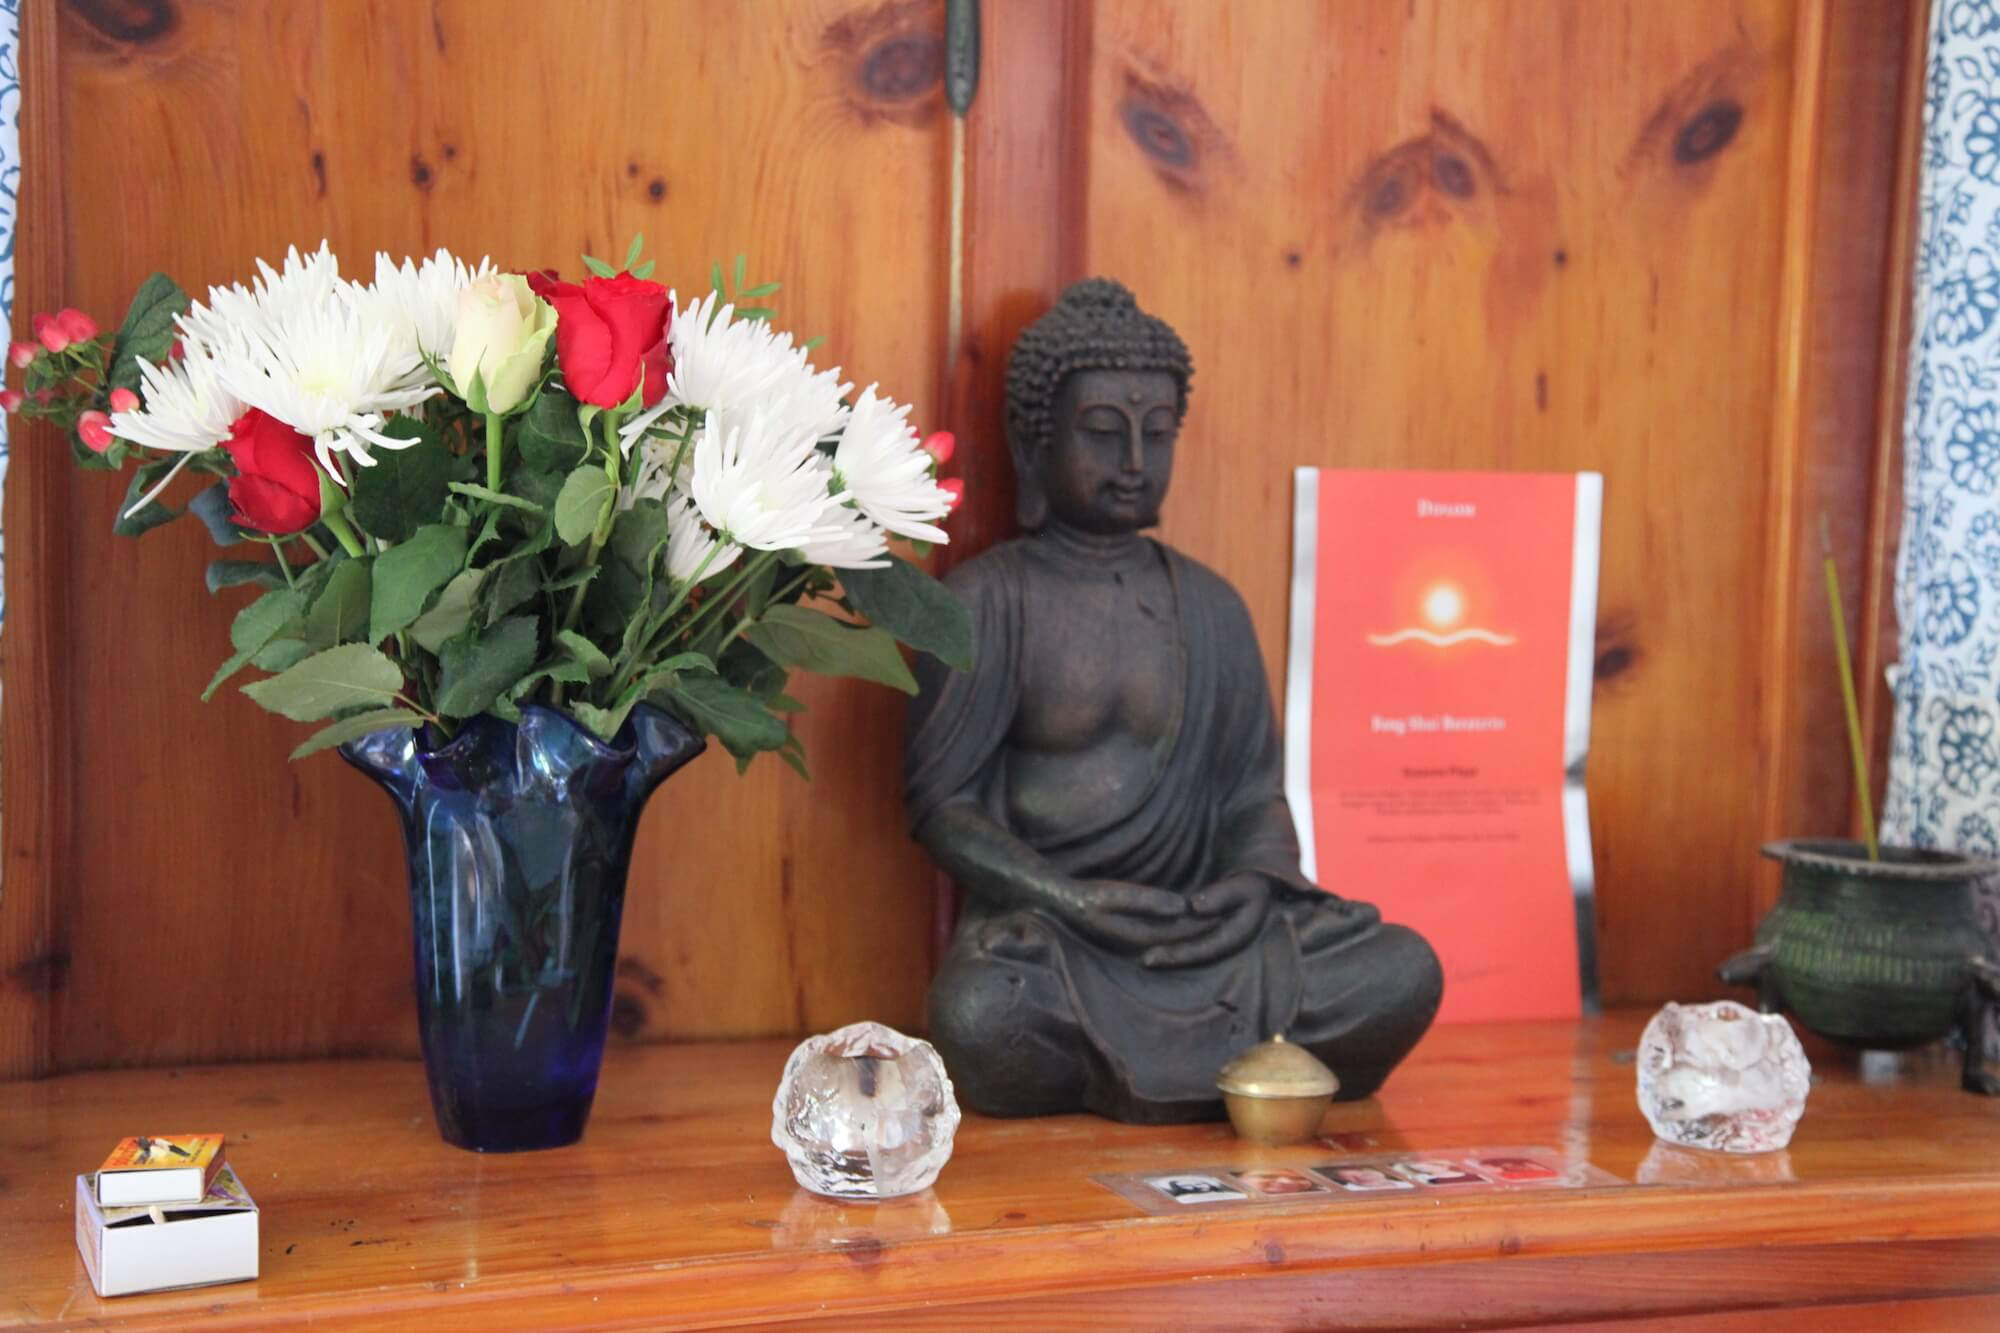 Naturschamane_Feng_Shui_Samanische_Seminare_Spirituelles_Coaching_Essenzen_Meditationen_Vasnaro_11.jpg